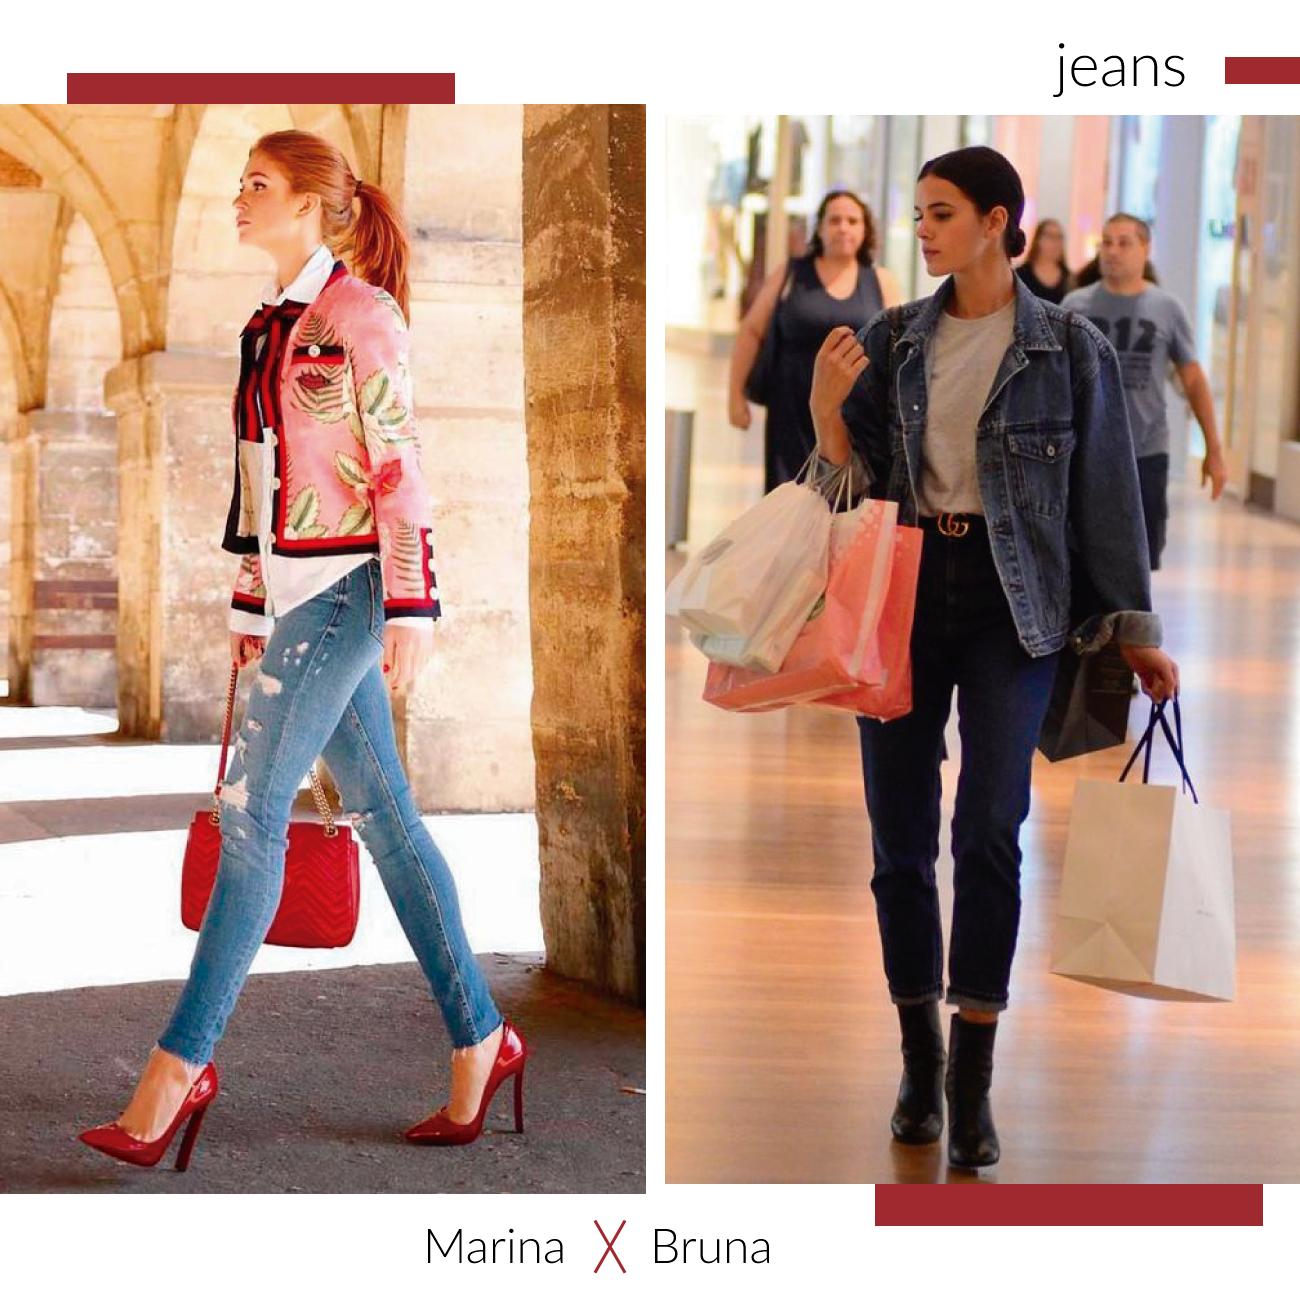 jeans marina ruim barbosa e bruna marquezine